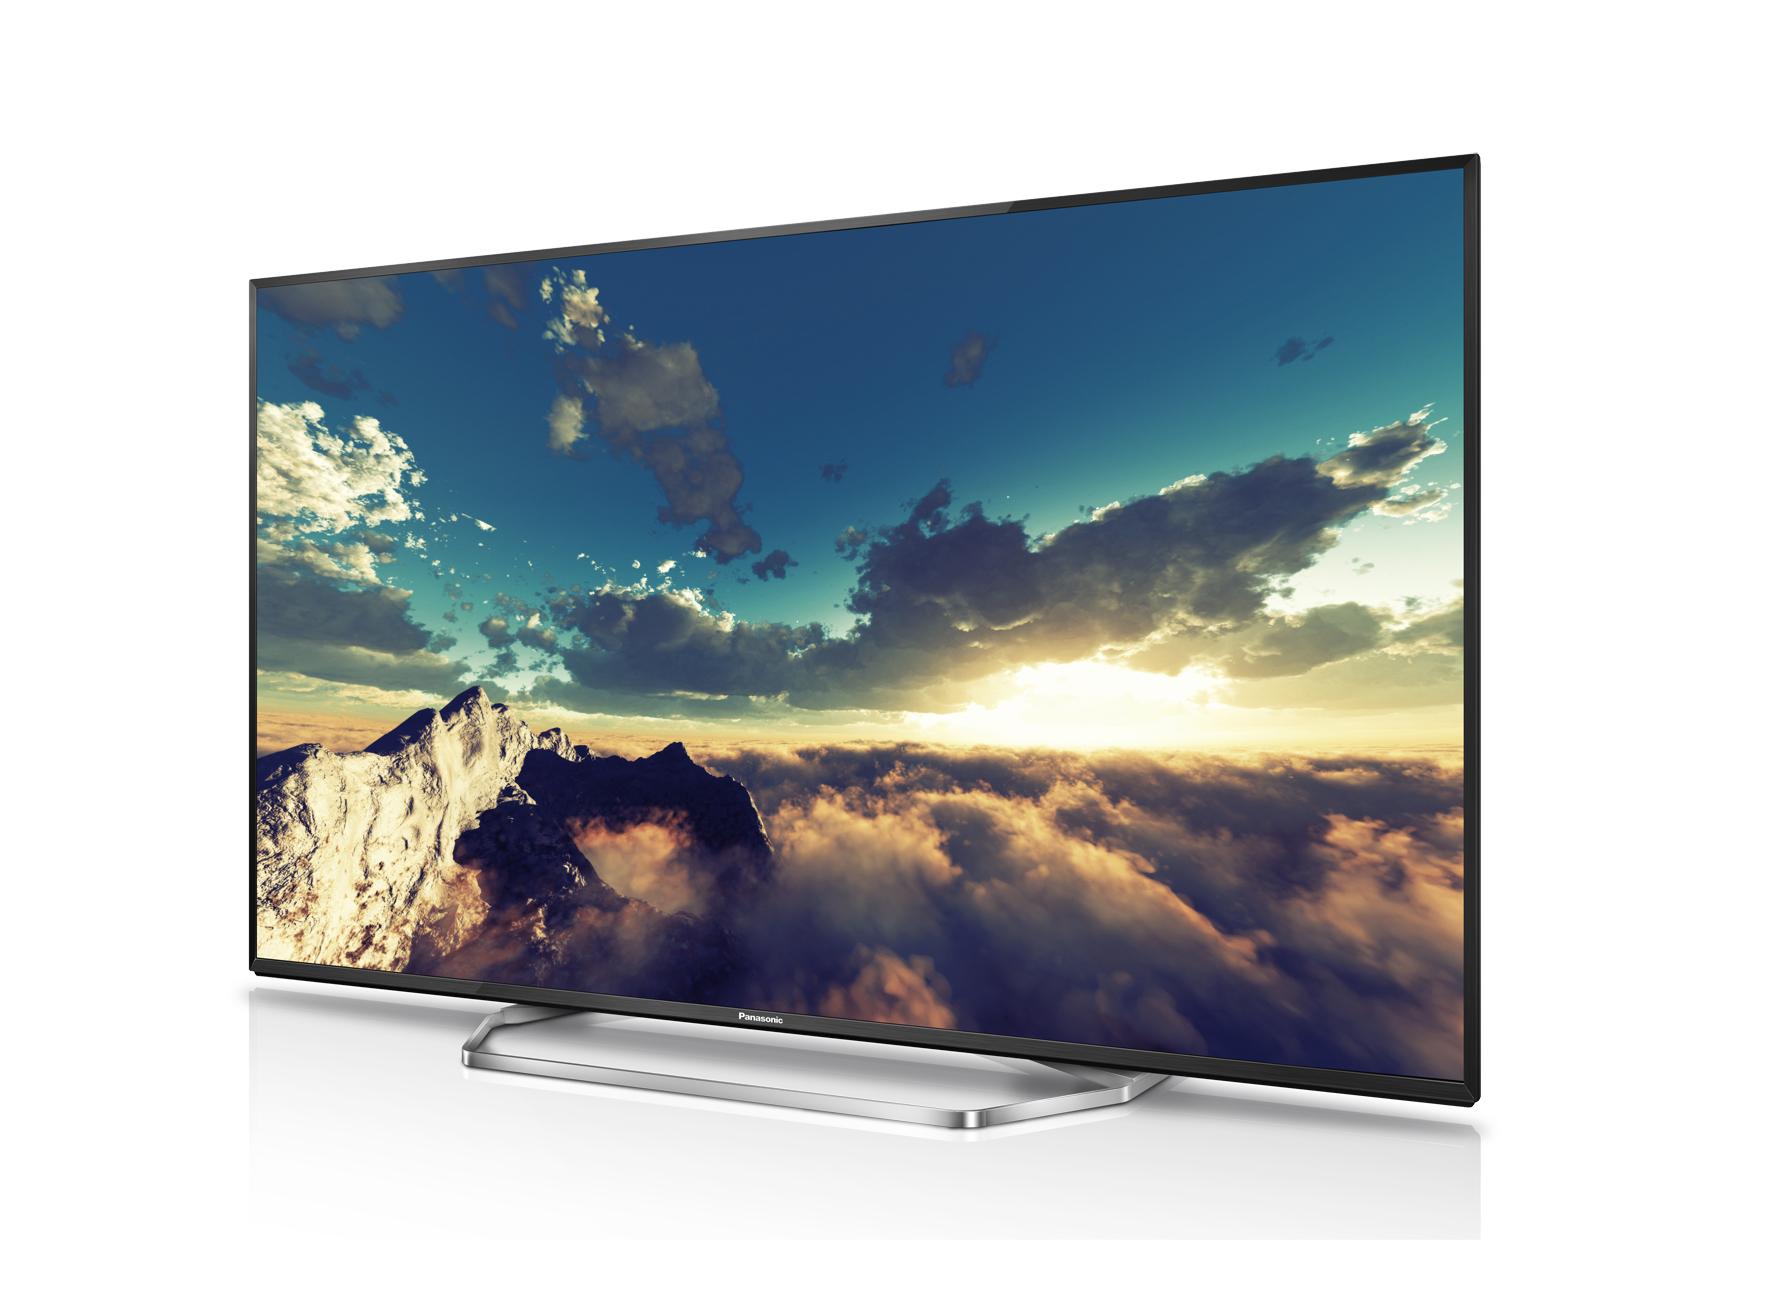 Panasonic Viera TX-65CXW704 TV 64 Bit